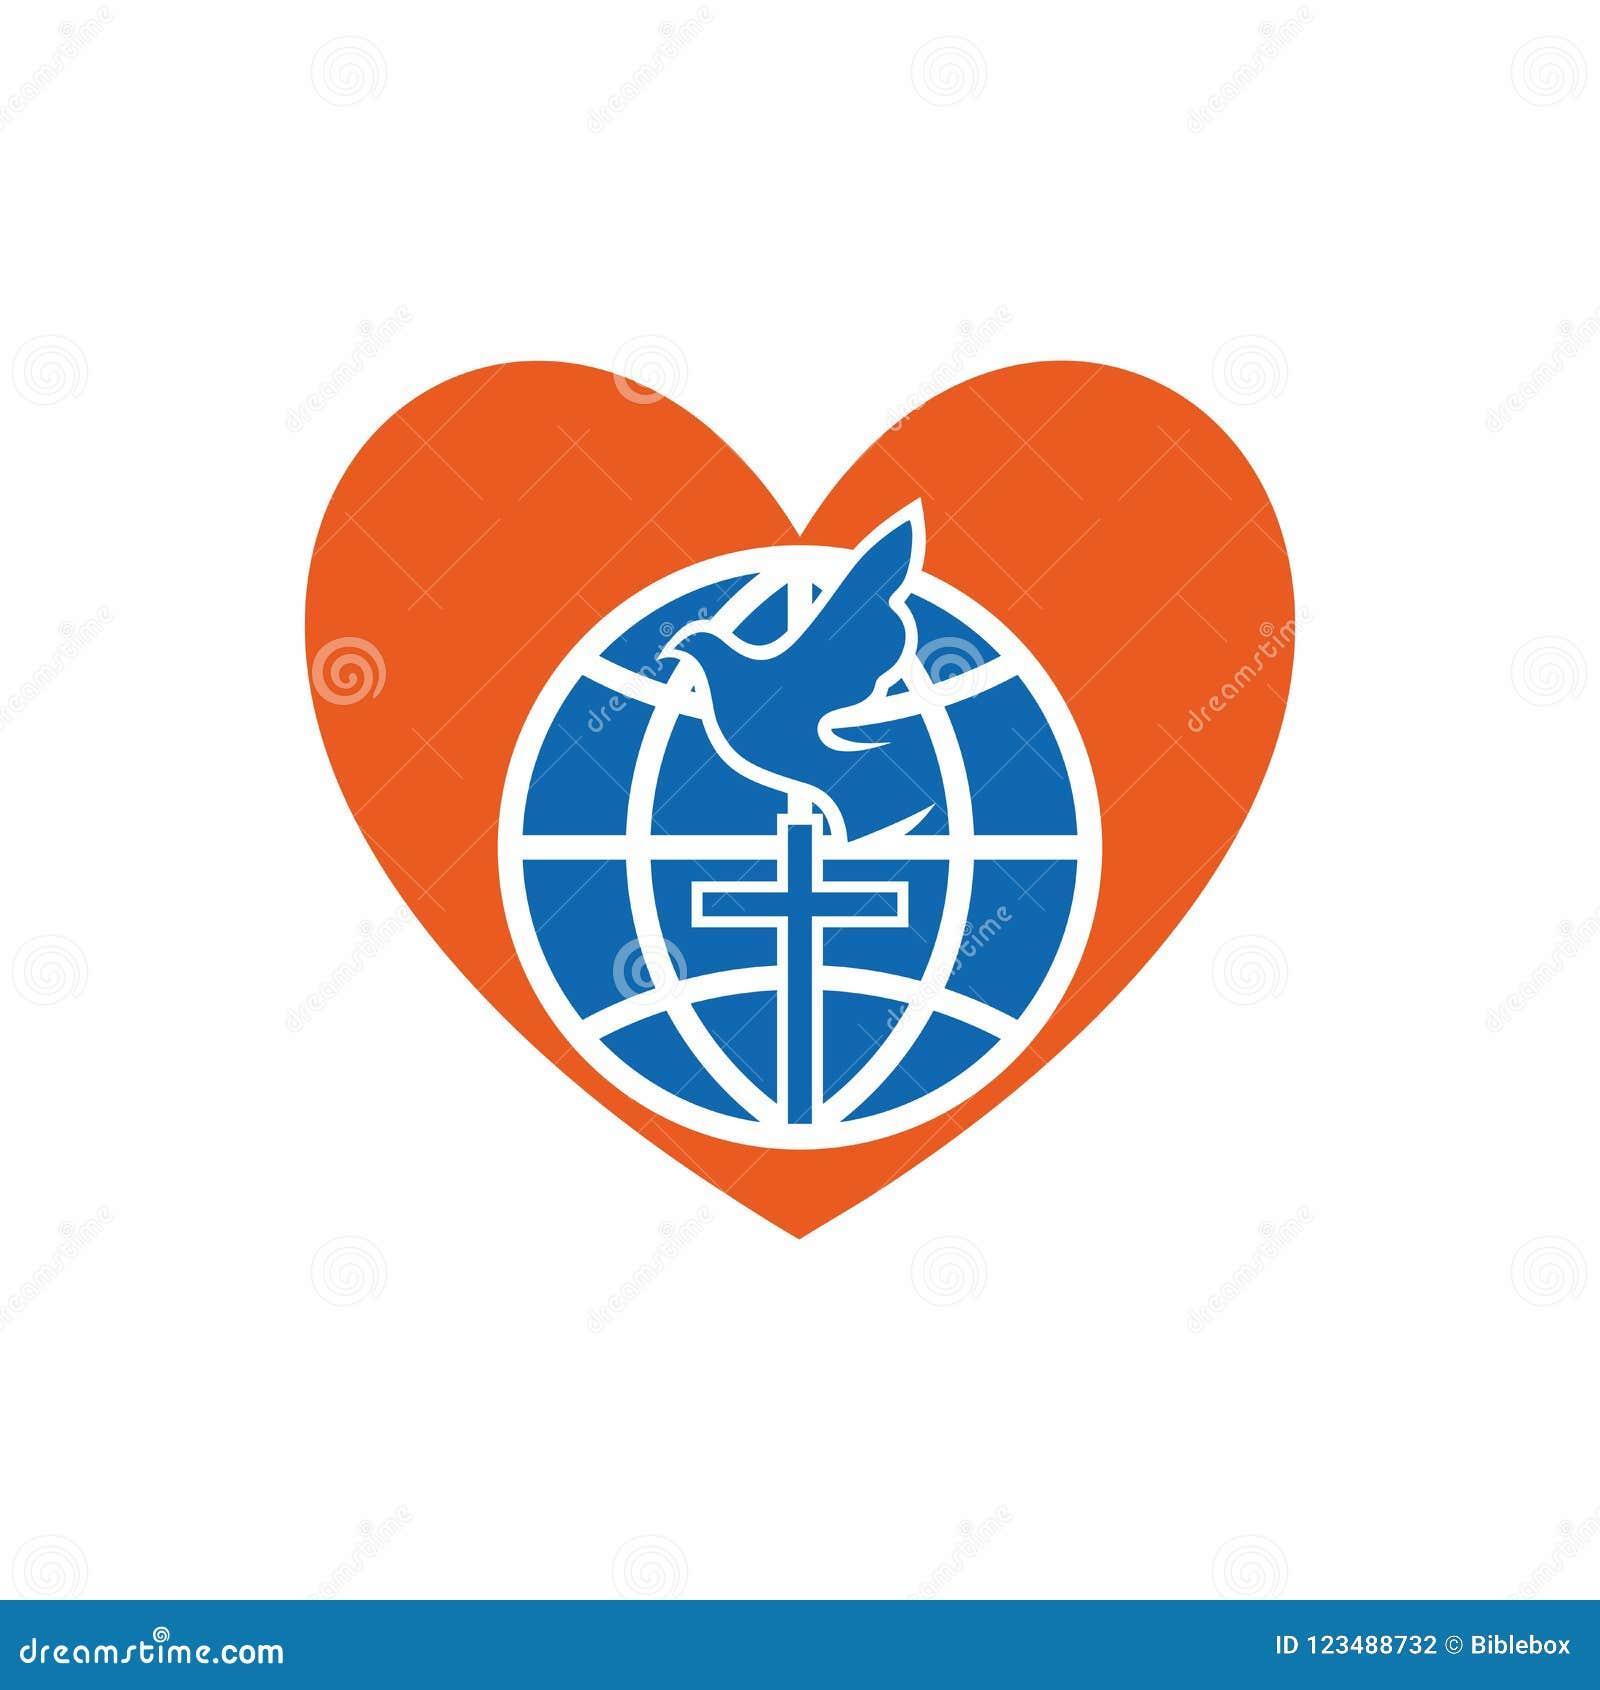 Church logo christian symbols globe cross dove and heart stock download church logo christian symbols globe cross dove and heart stock vector thecheapjerseys Gallery